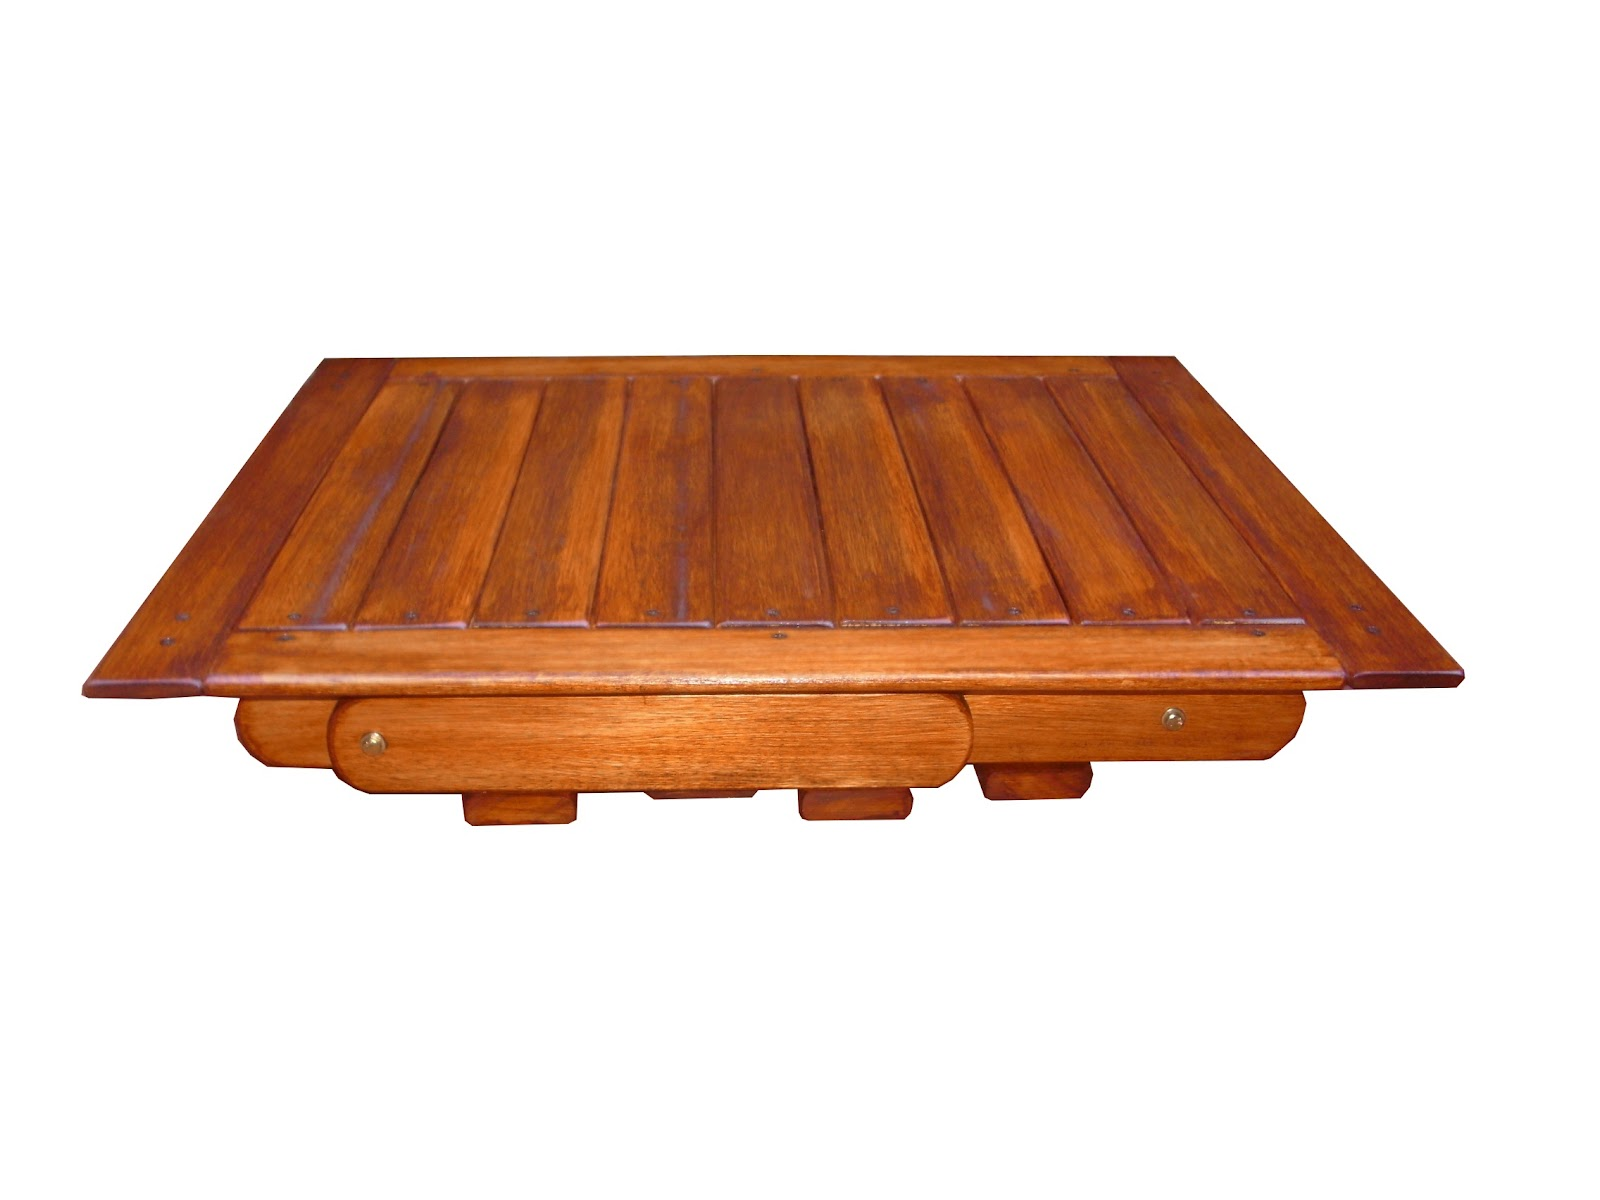 Mesa ratona plegable interior exterior carpinterof for Mesas de exterior plegables